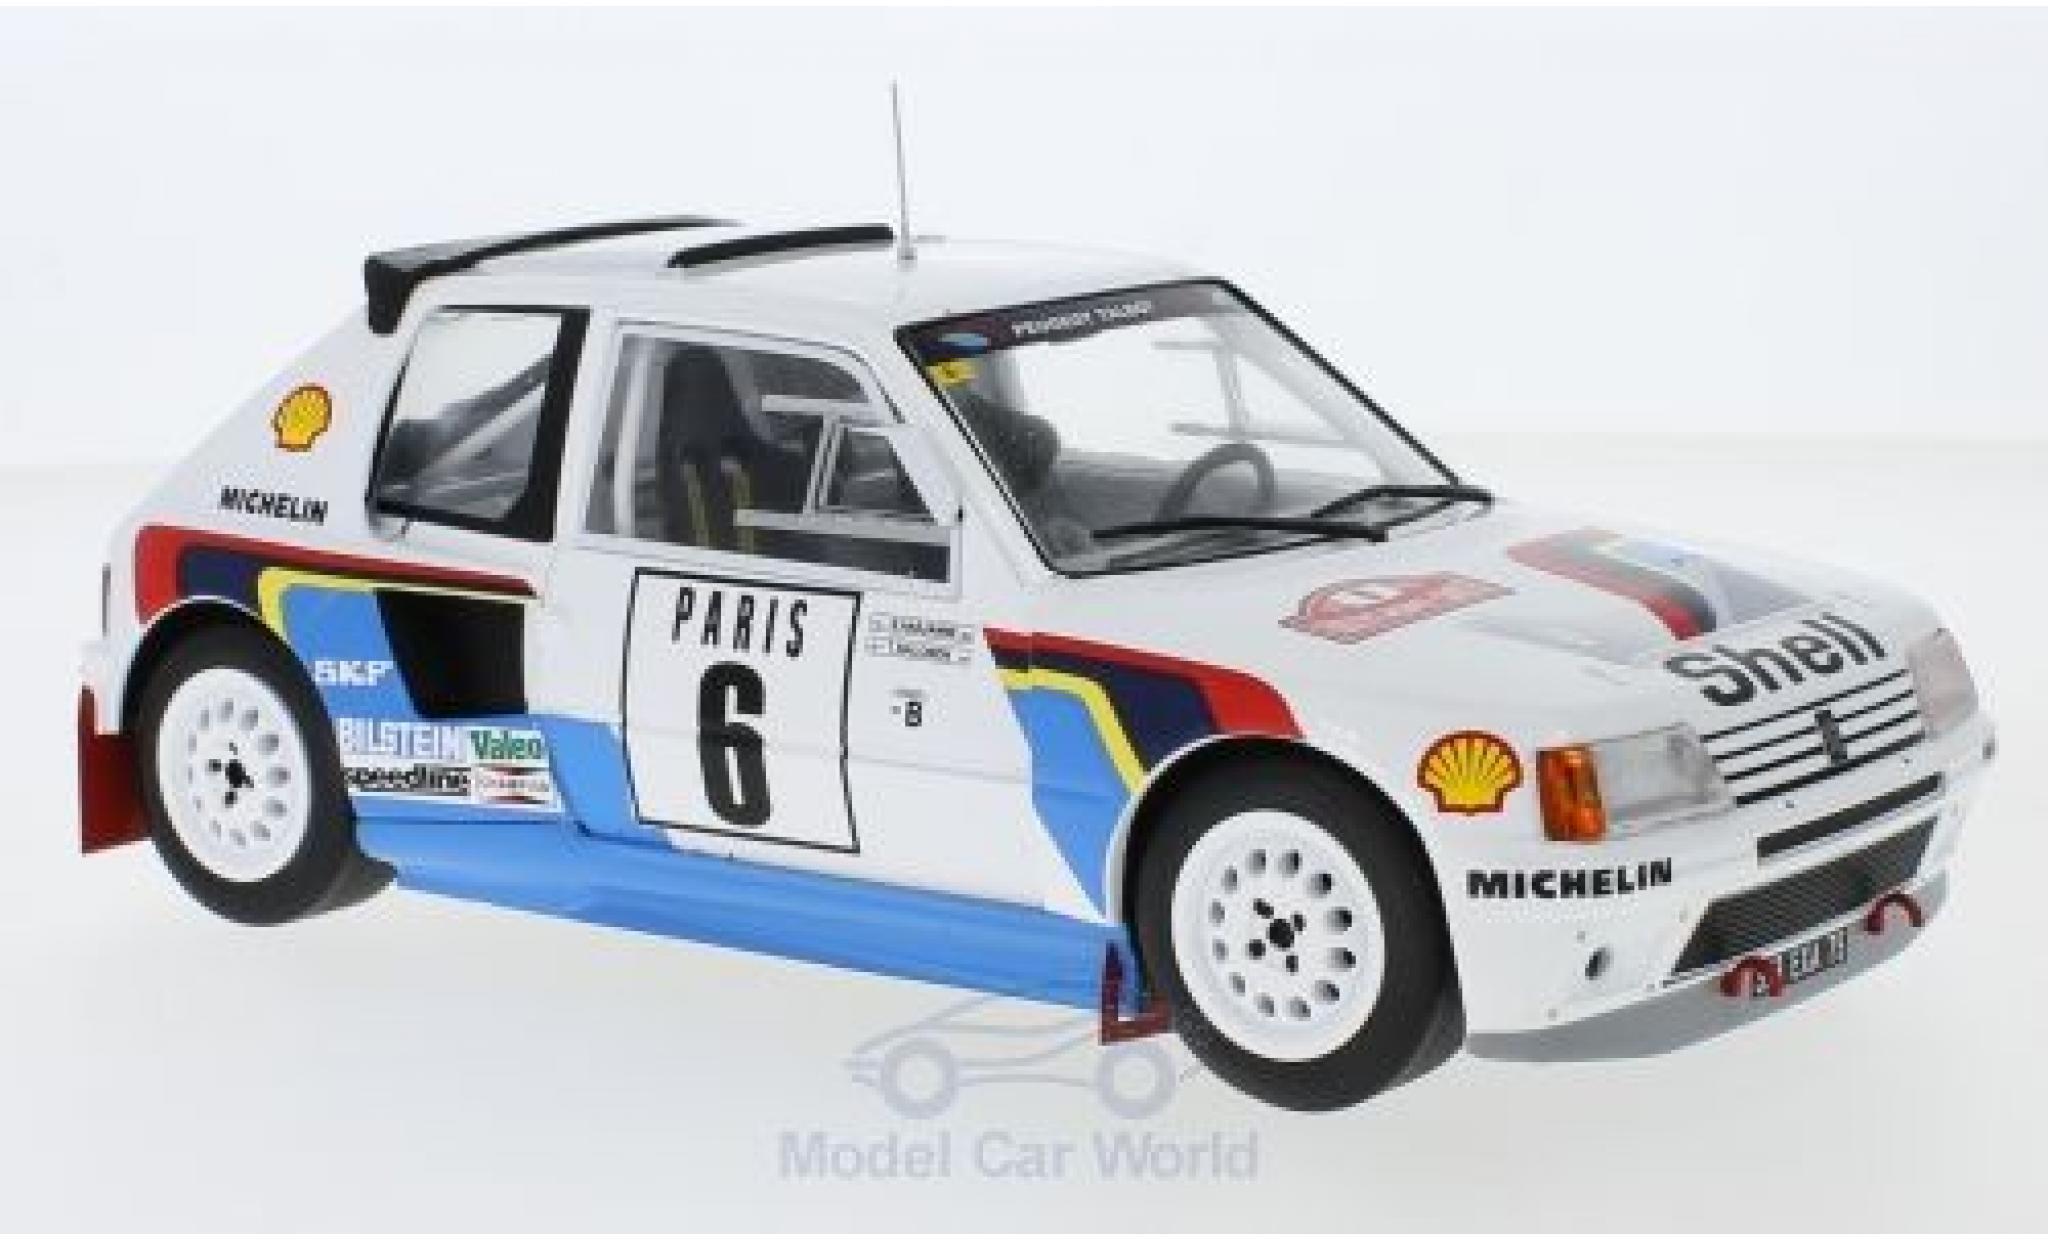 Peugeot 205 1/18 IXO T16 No.6 Rallye WM Rallye Monte Carlo 1985 T.Salonen/S.Harjanen